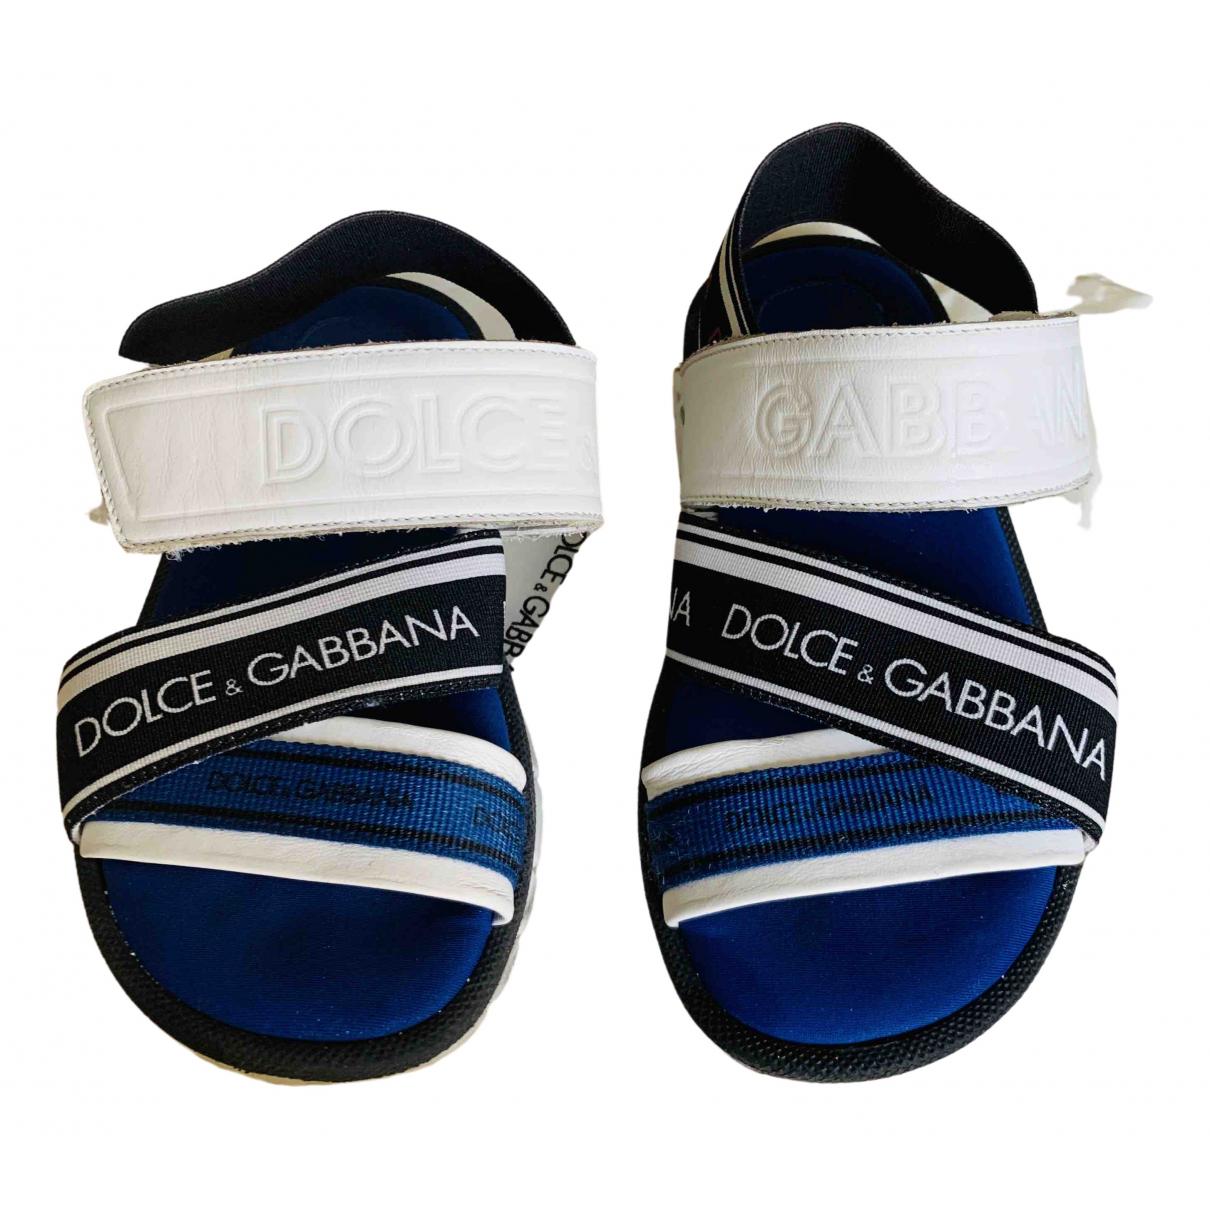 Dolce & Gabbana - Sandales   pour enfant en toile - bleu